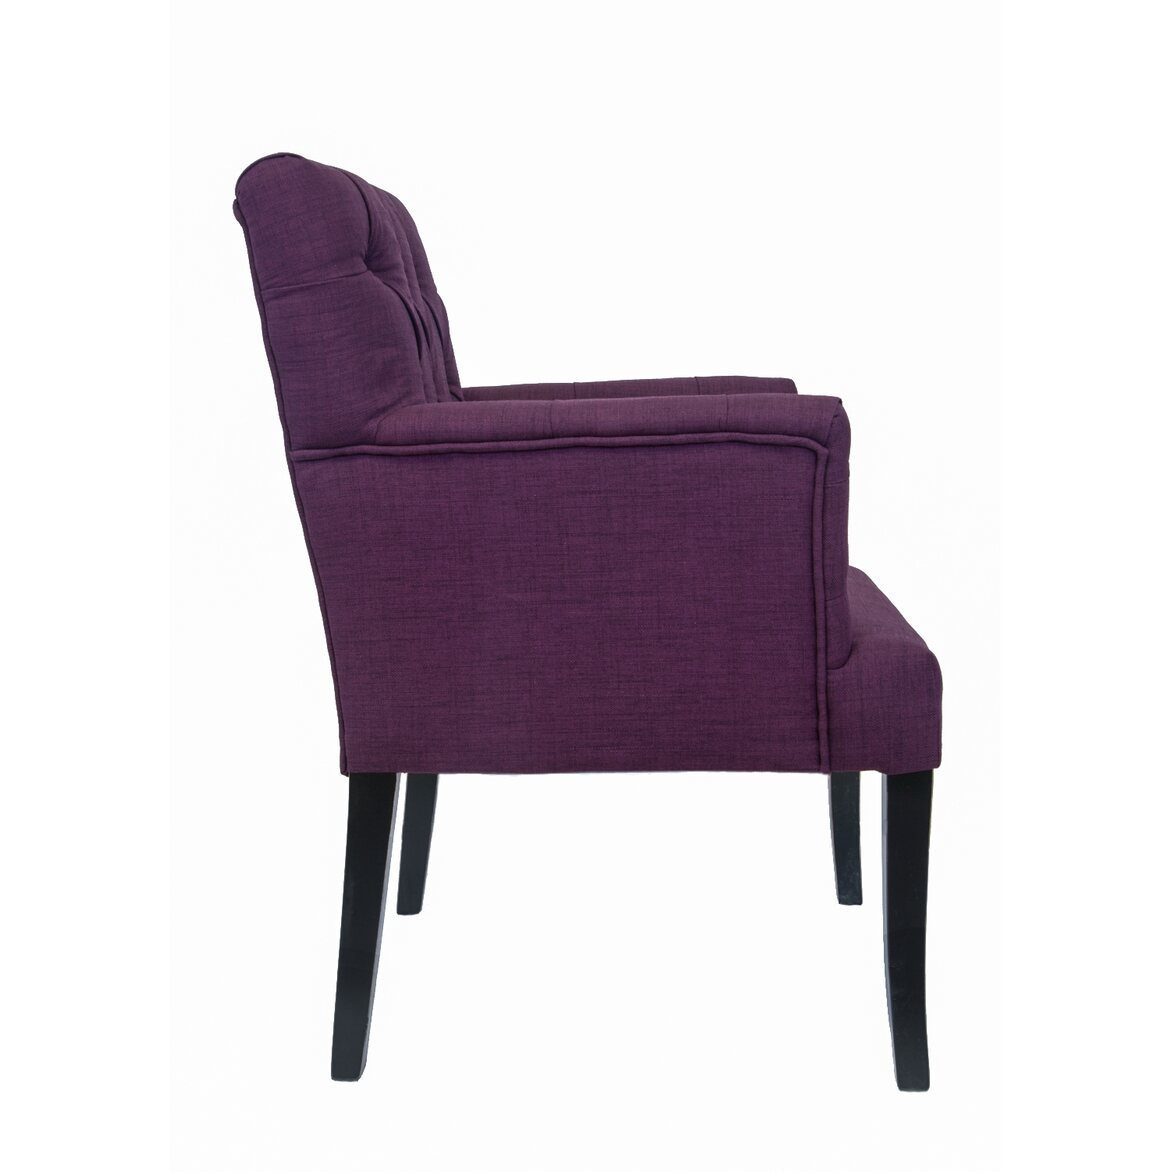 Кресло Zander purple 2 | Кресло-стул Kingsby